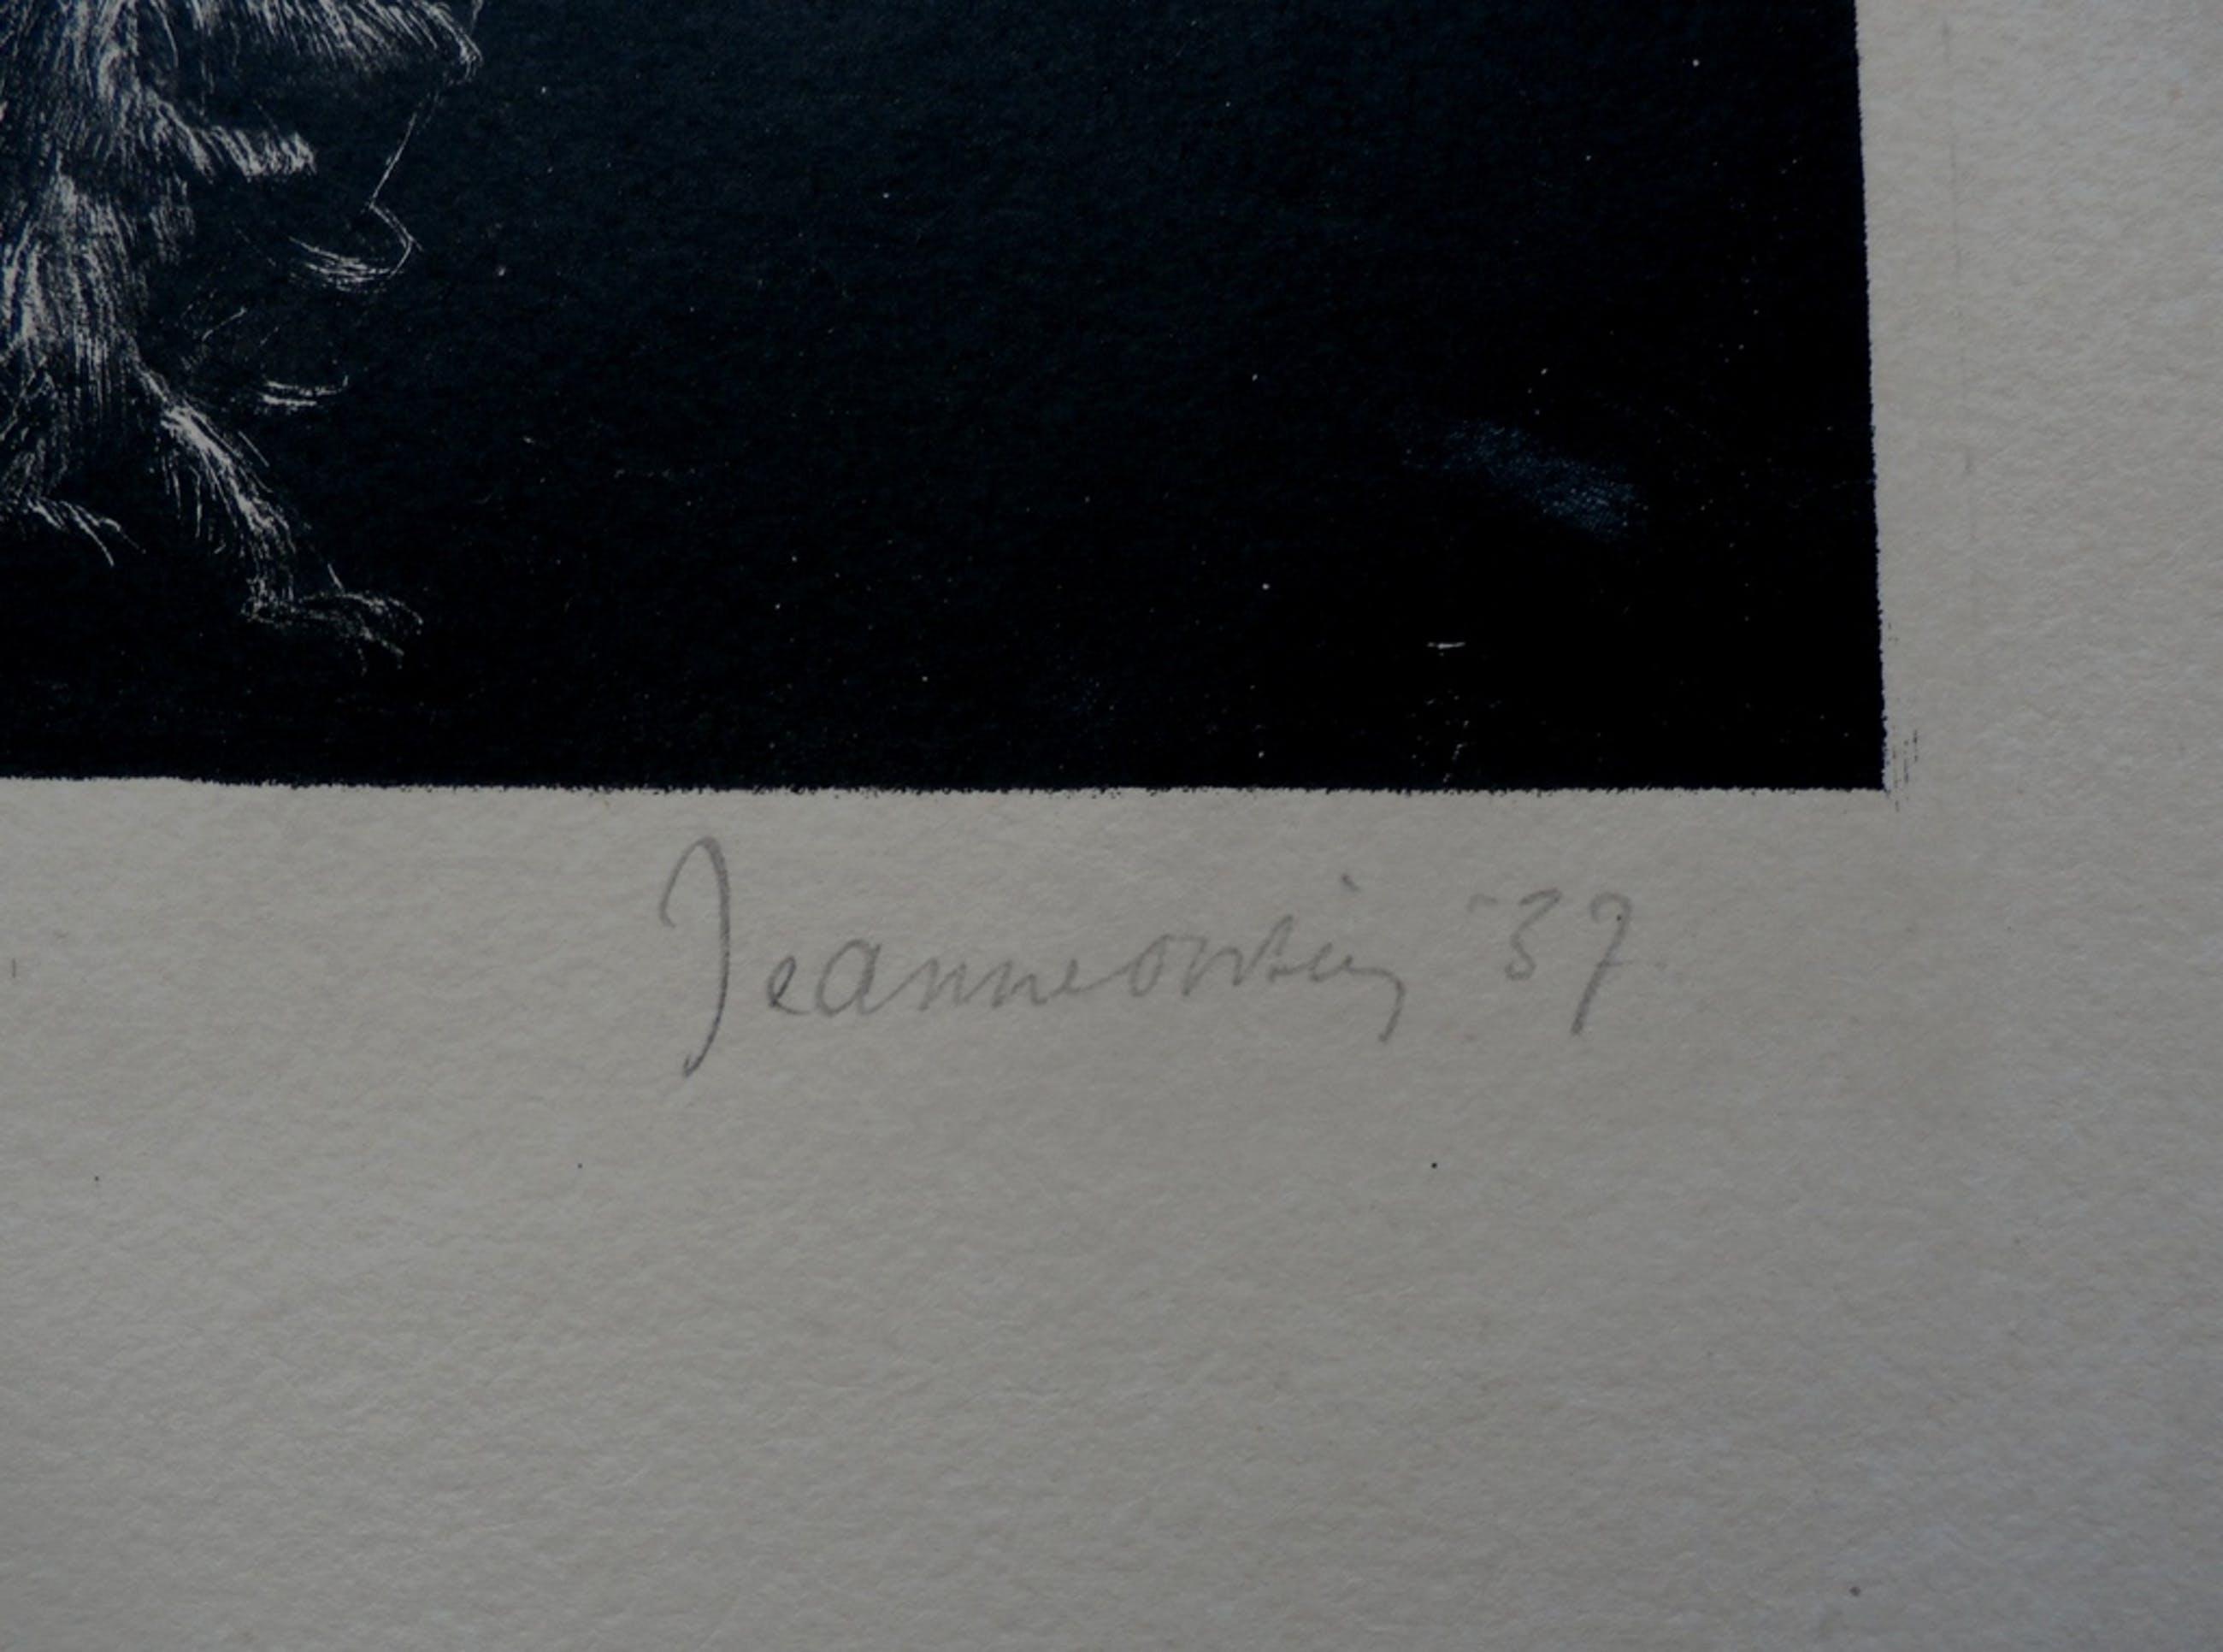 Jeanne Biruma Oosting, handgesigneerde litho, 1937e kopen? Bied vanaf 85!